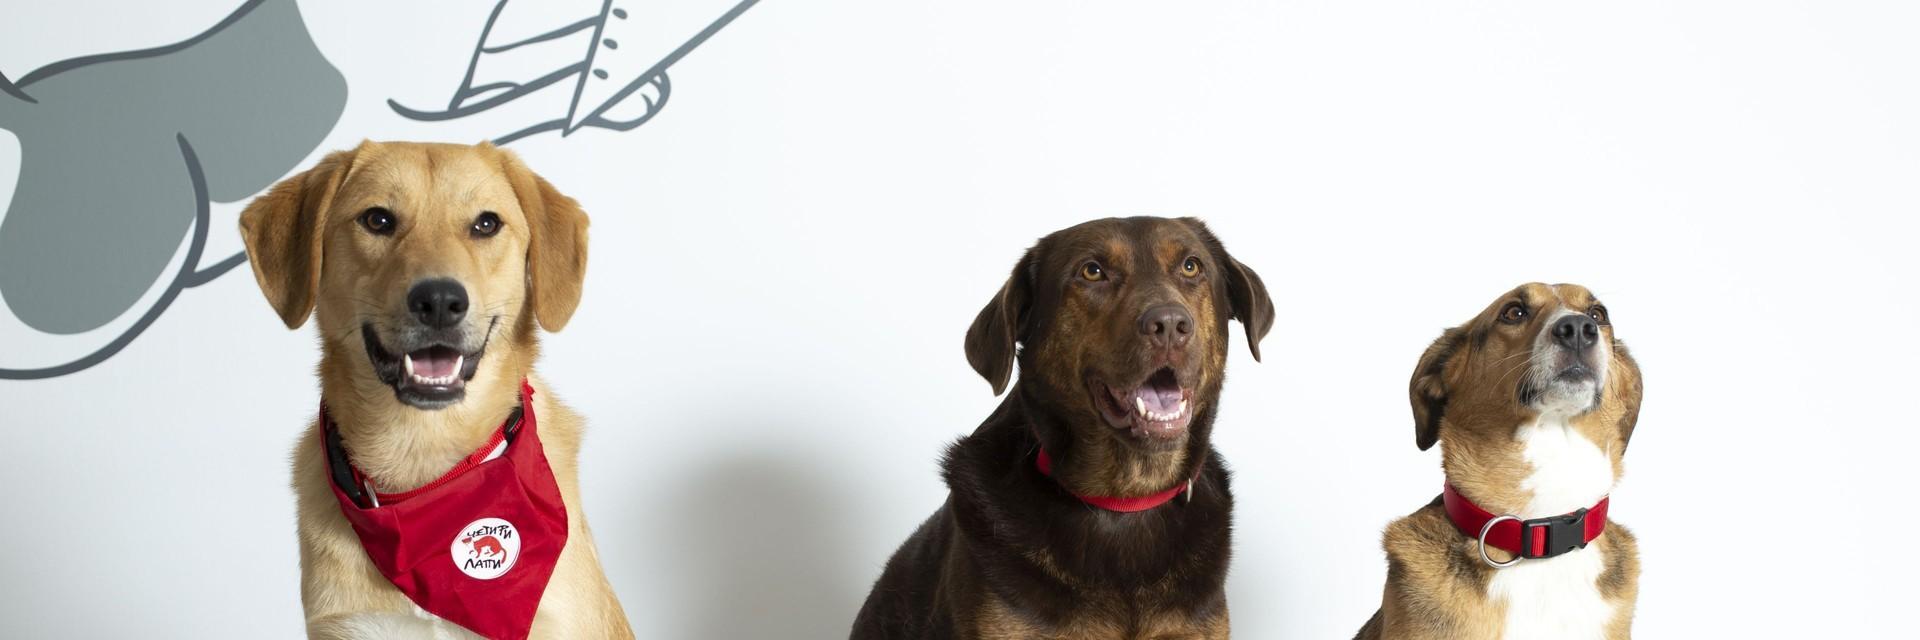 Therapy dogs FOUR PAWS Bulgaria